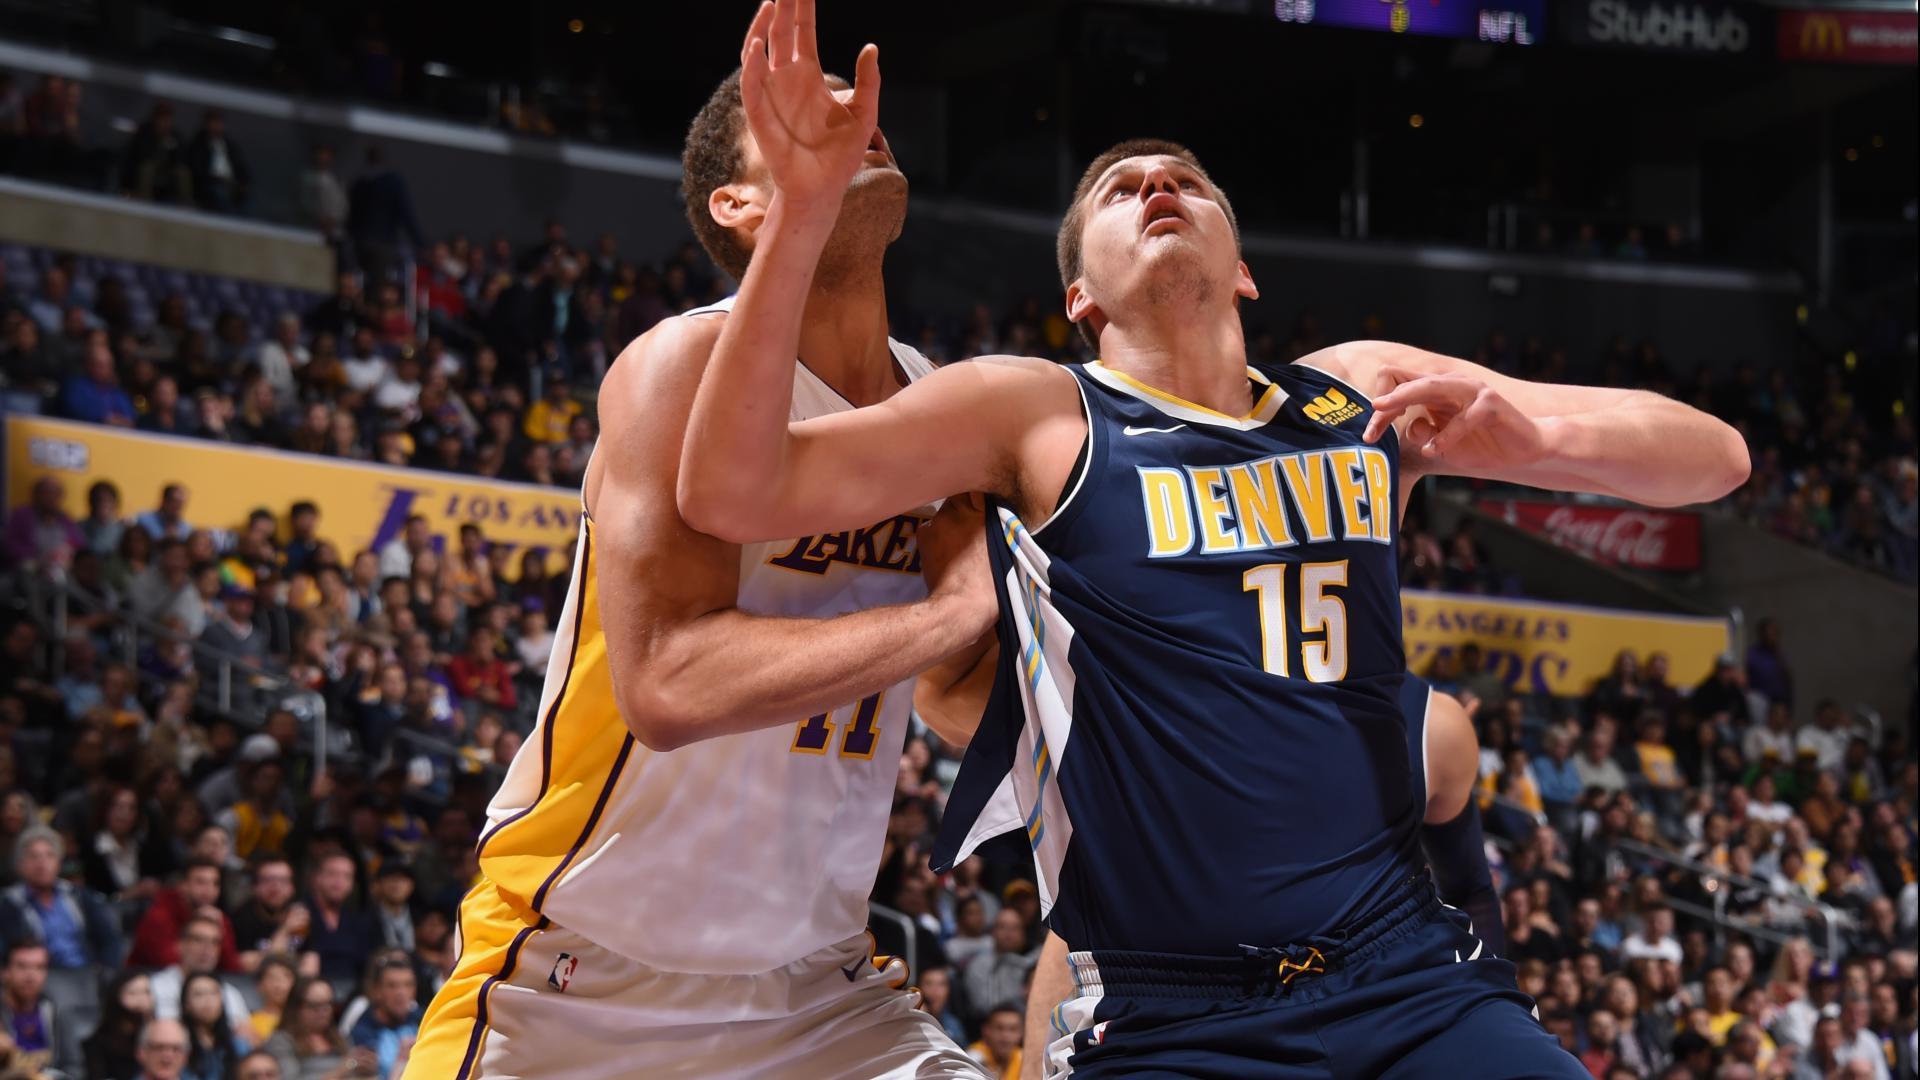 Денвер — Портленд. Прогноз на матч 14 января 2019. НБА